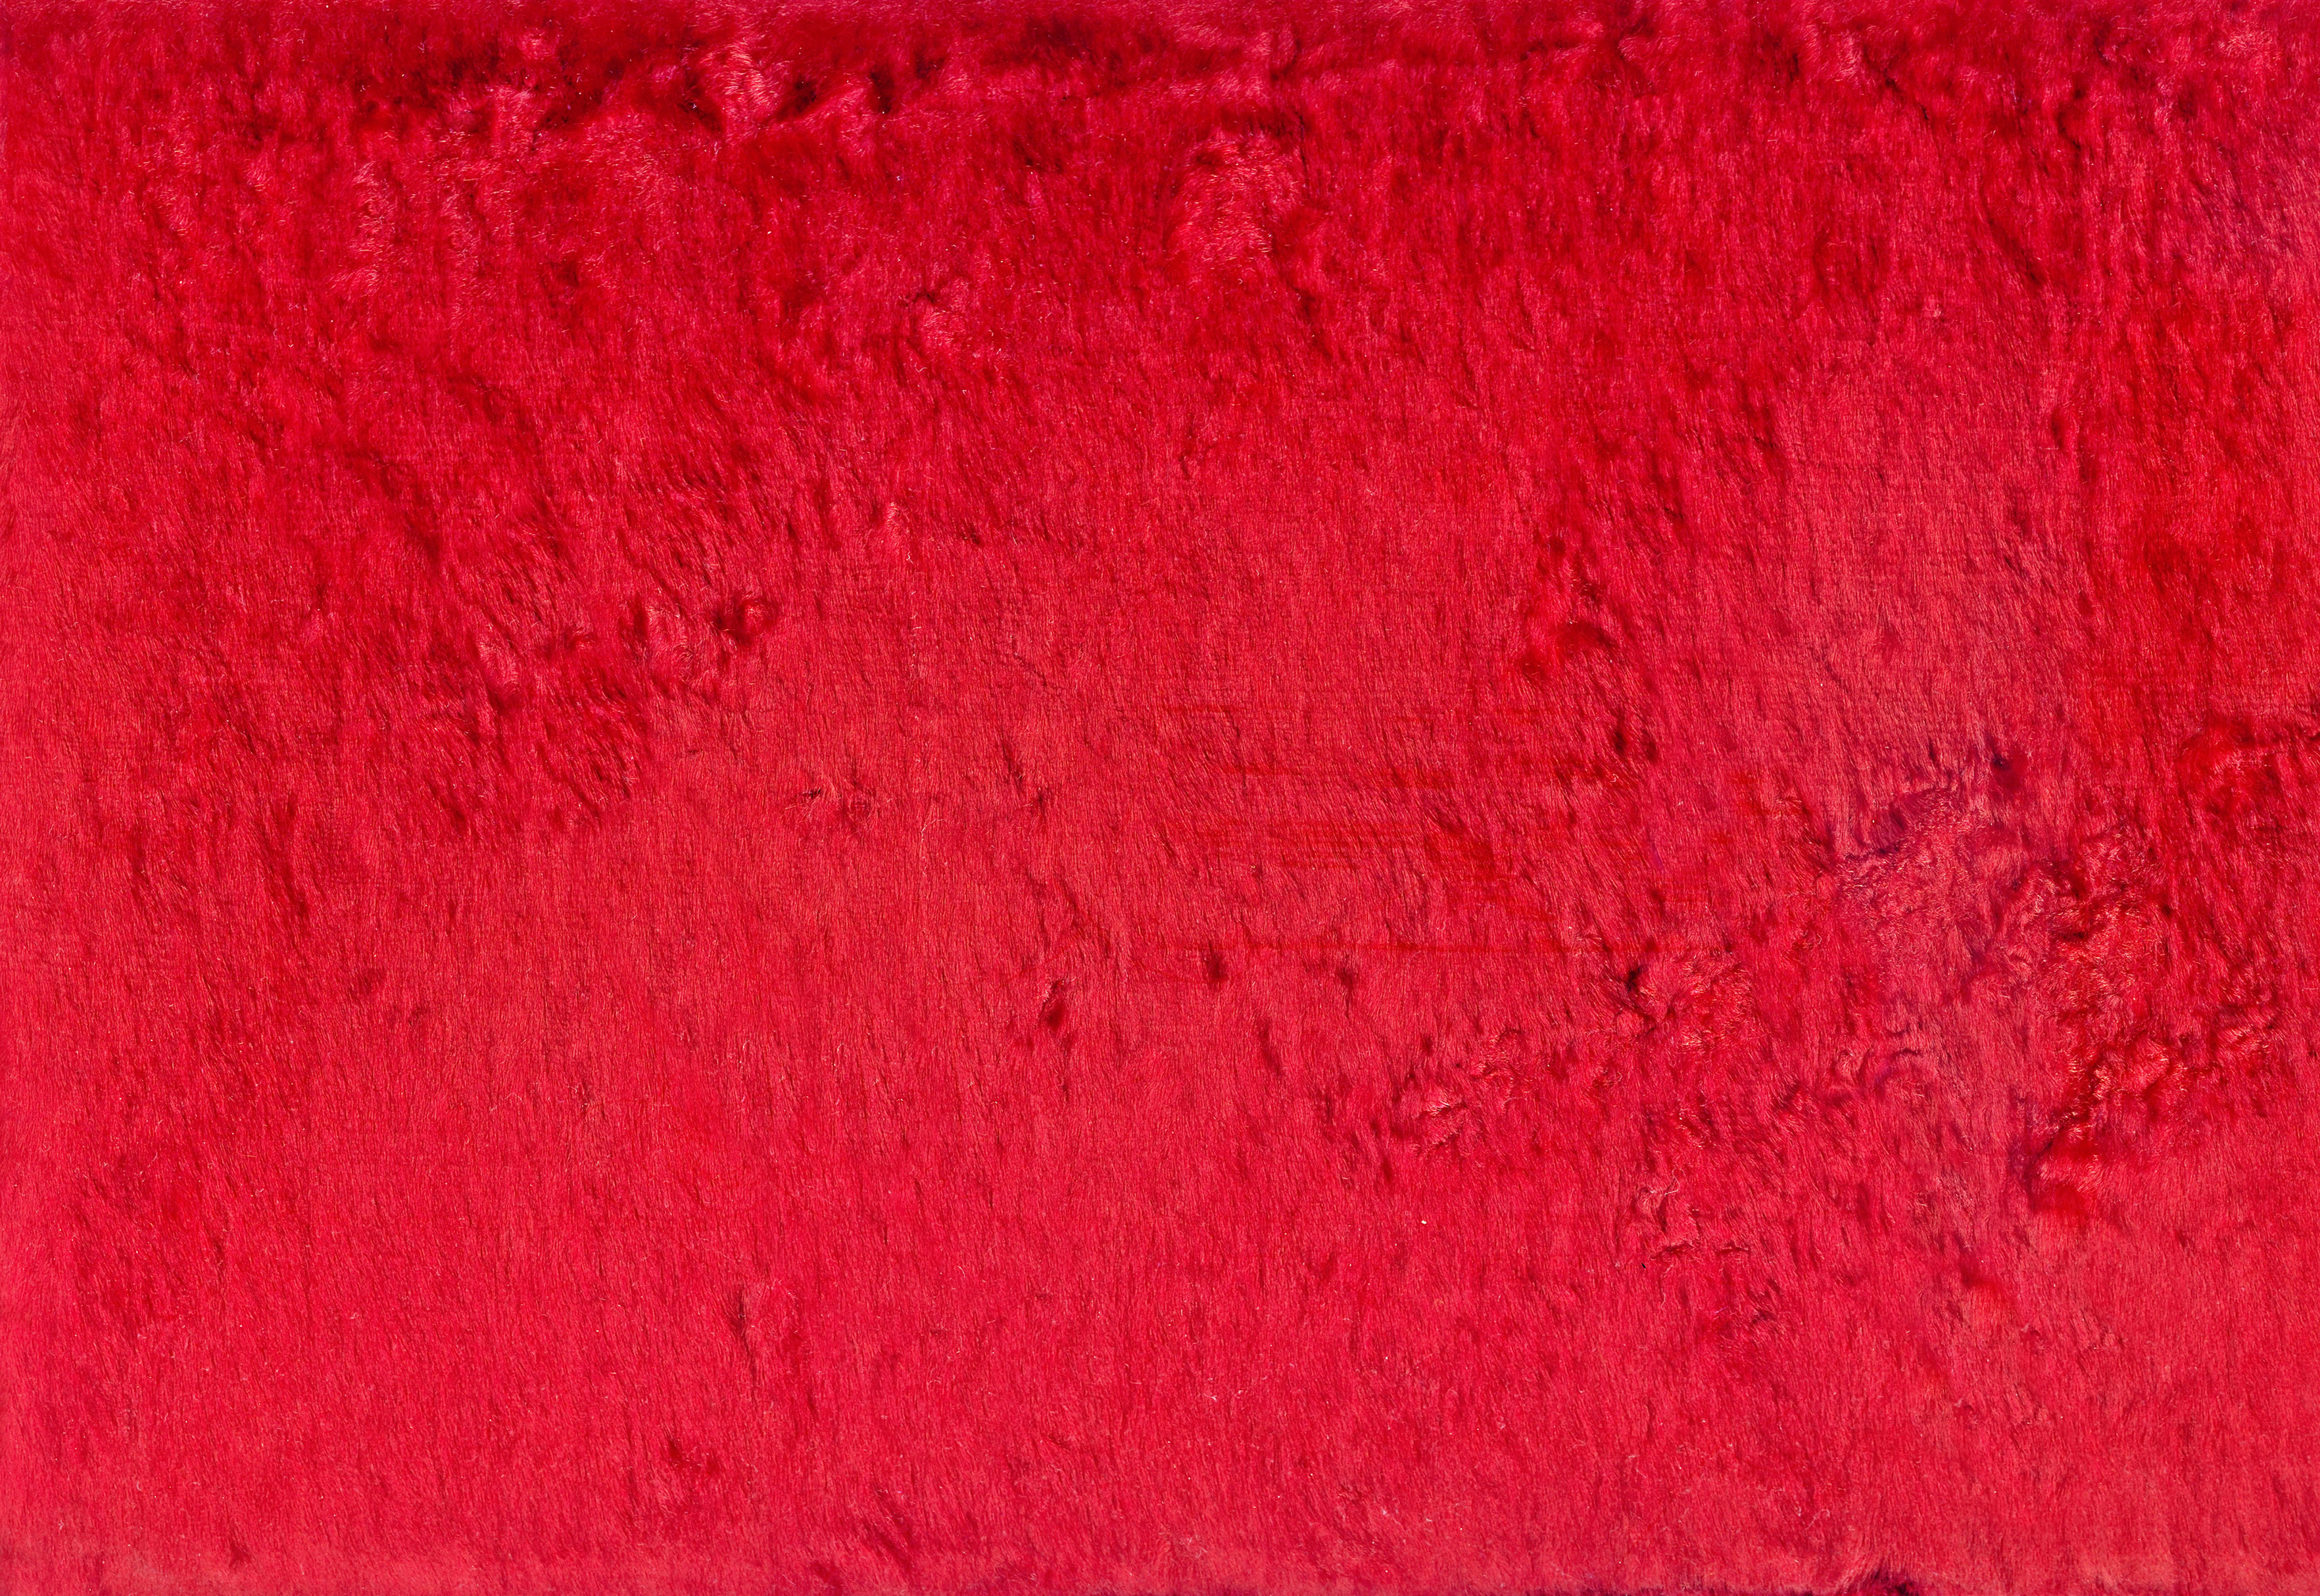 red velvet background texture, red velvet, fabric cloth, texture ...